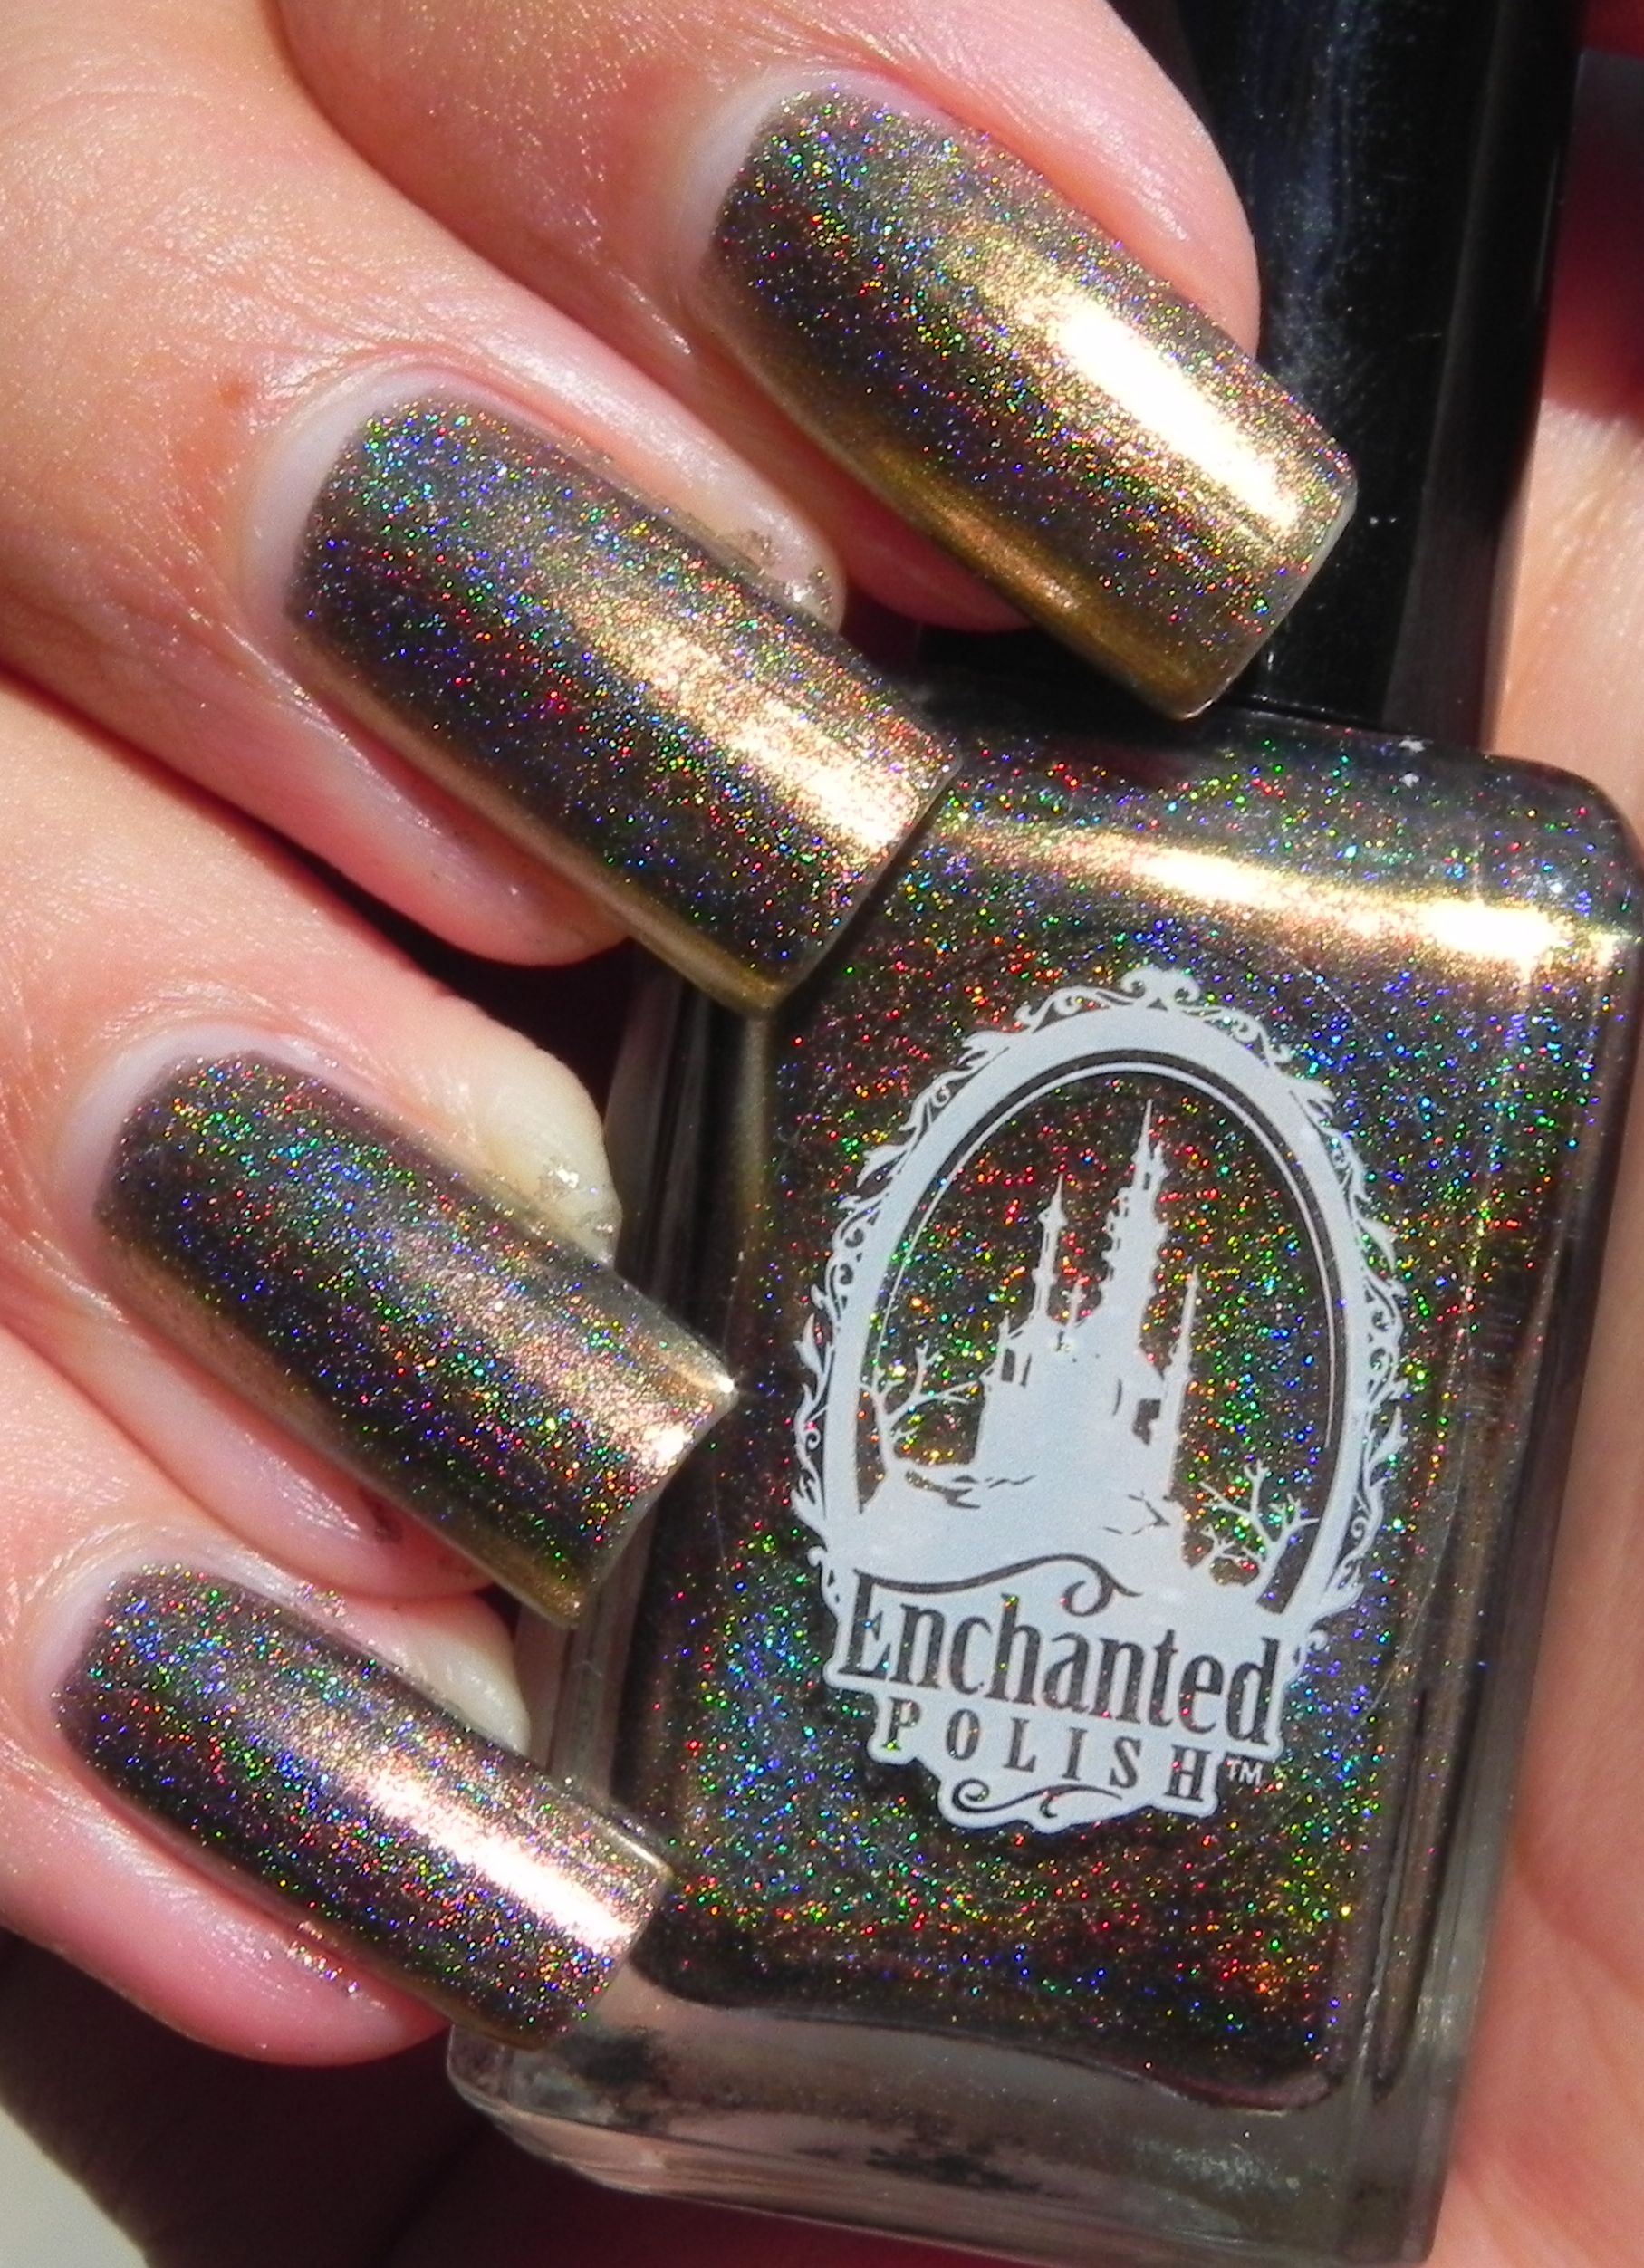 IG@catsandrabbits Enchanted Polish - Autumn